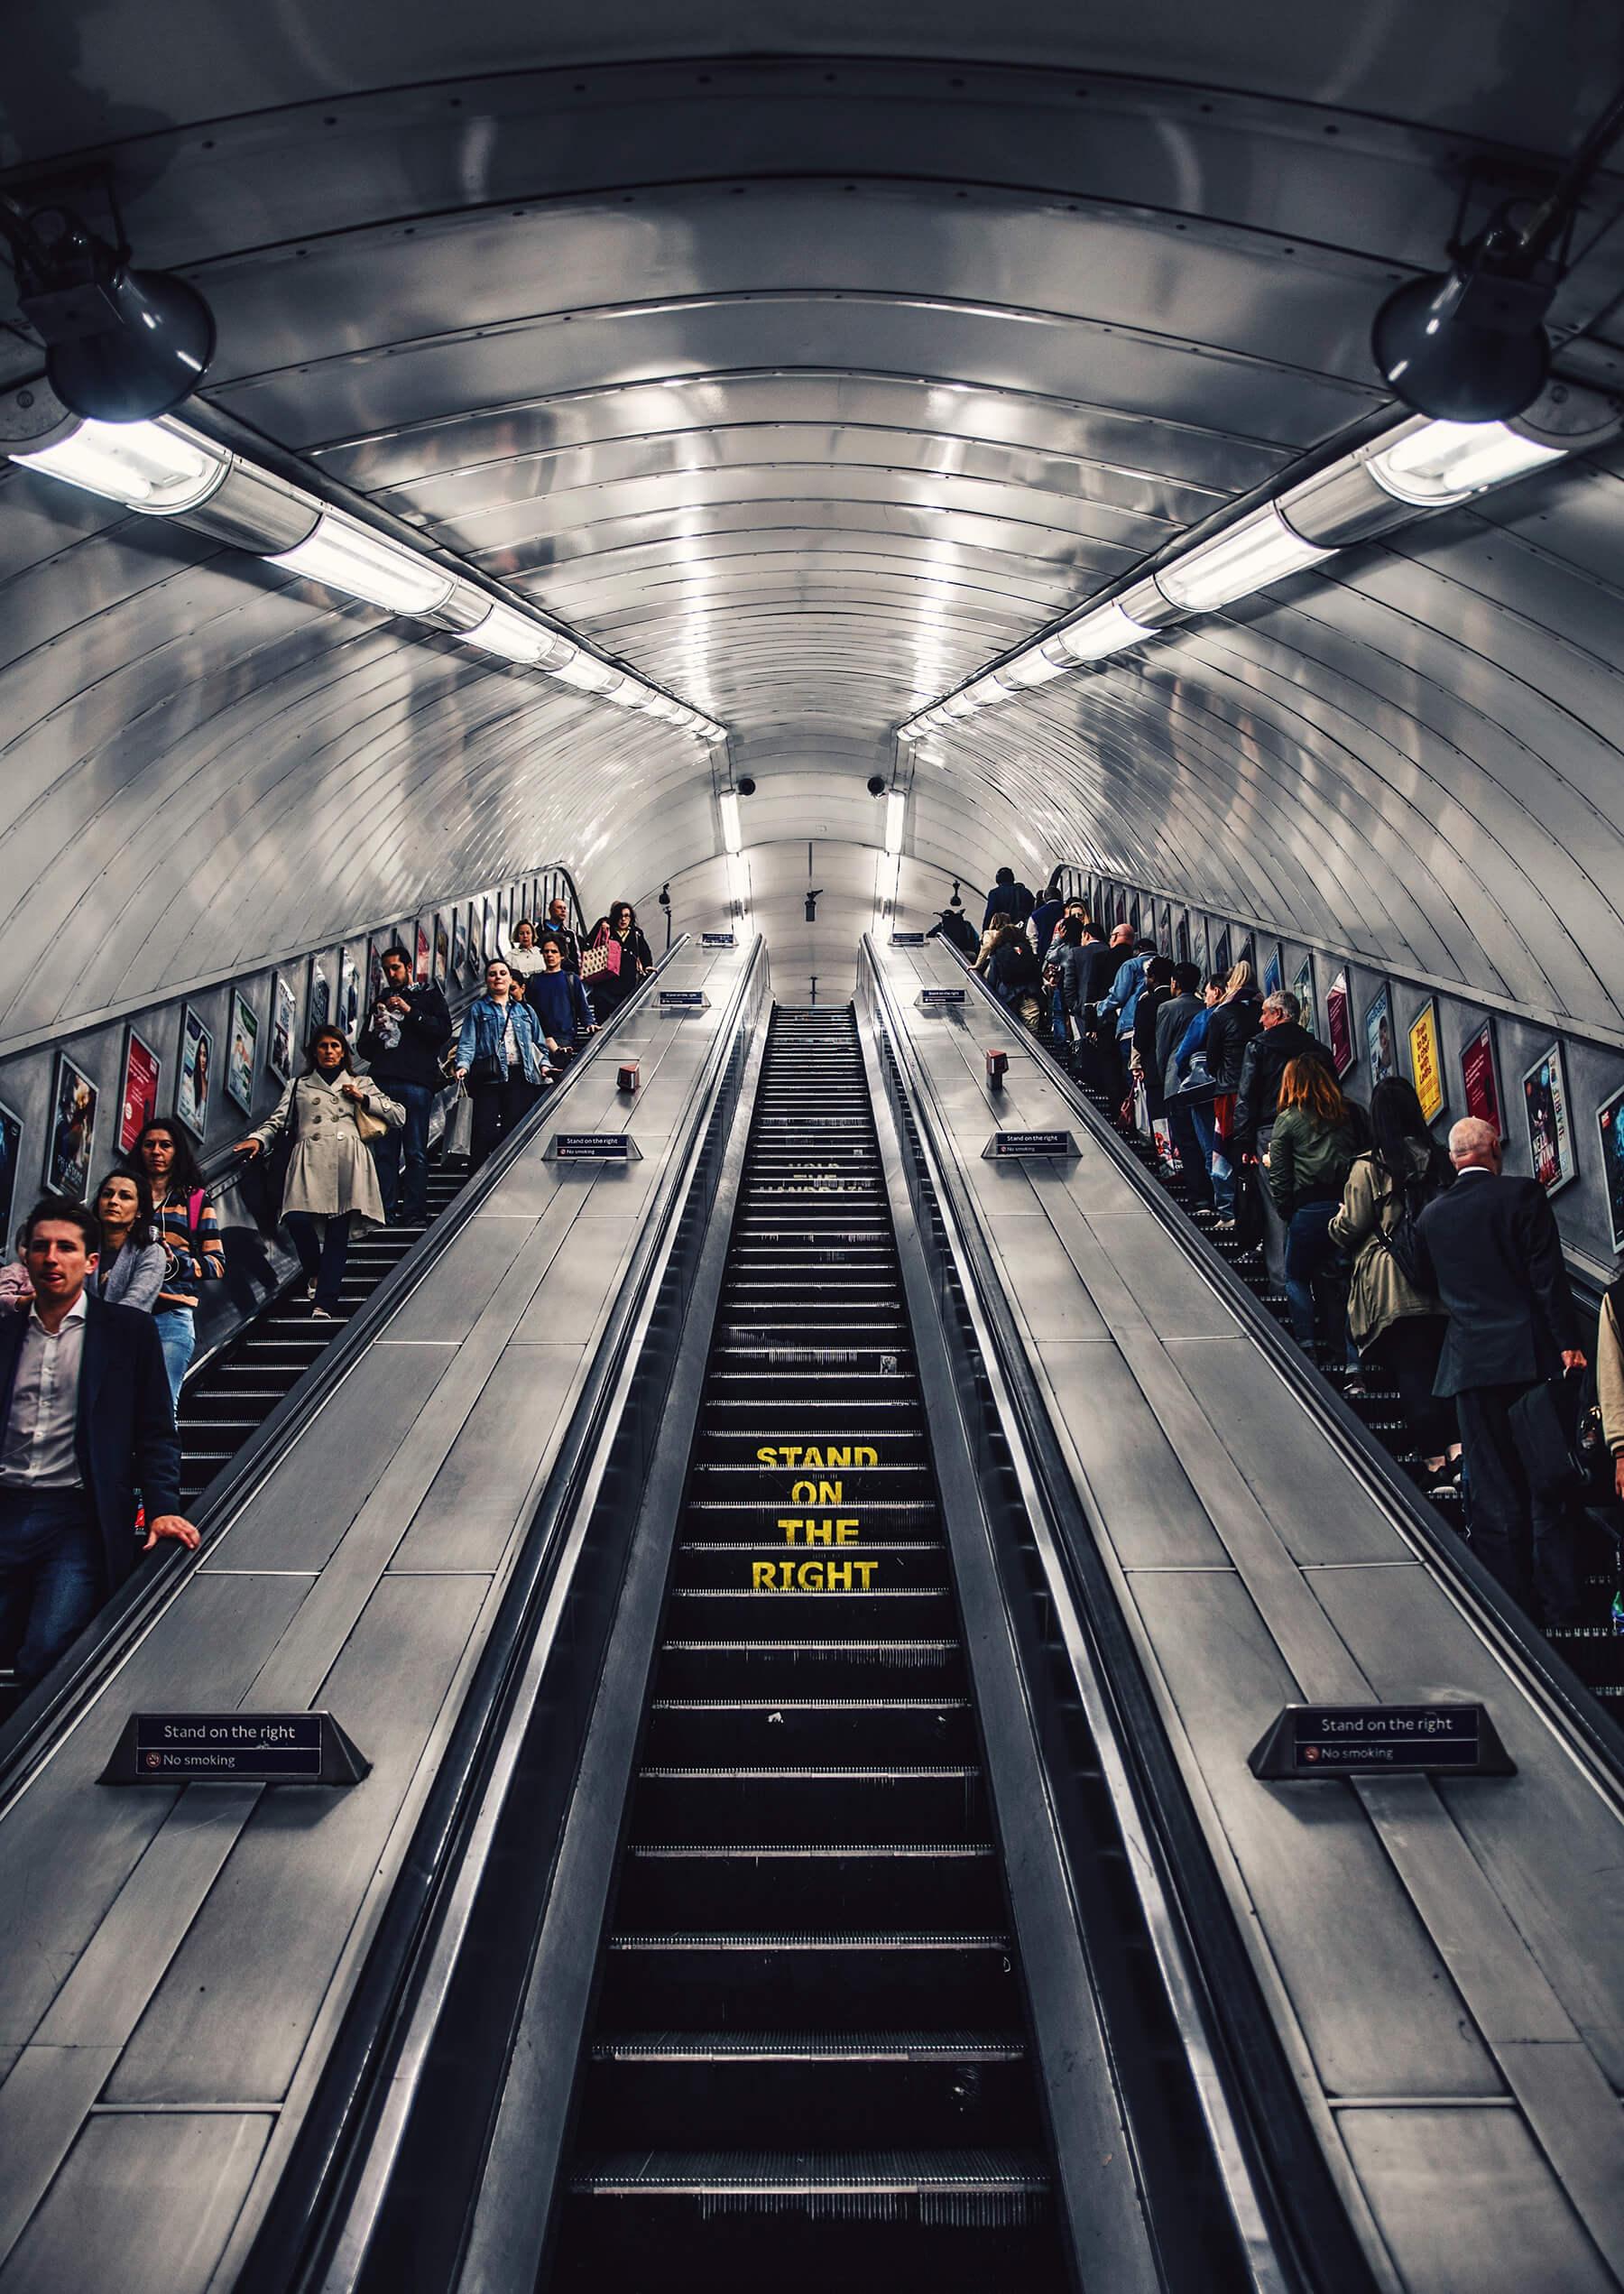 London underground street photography